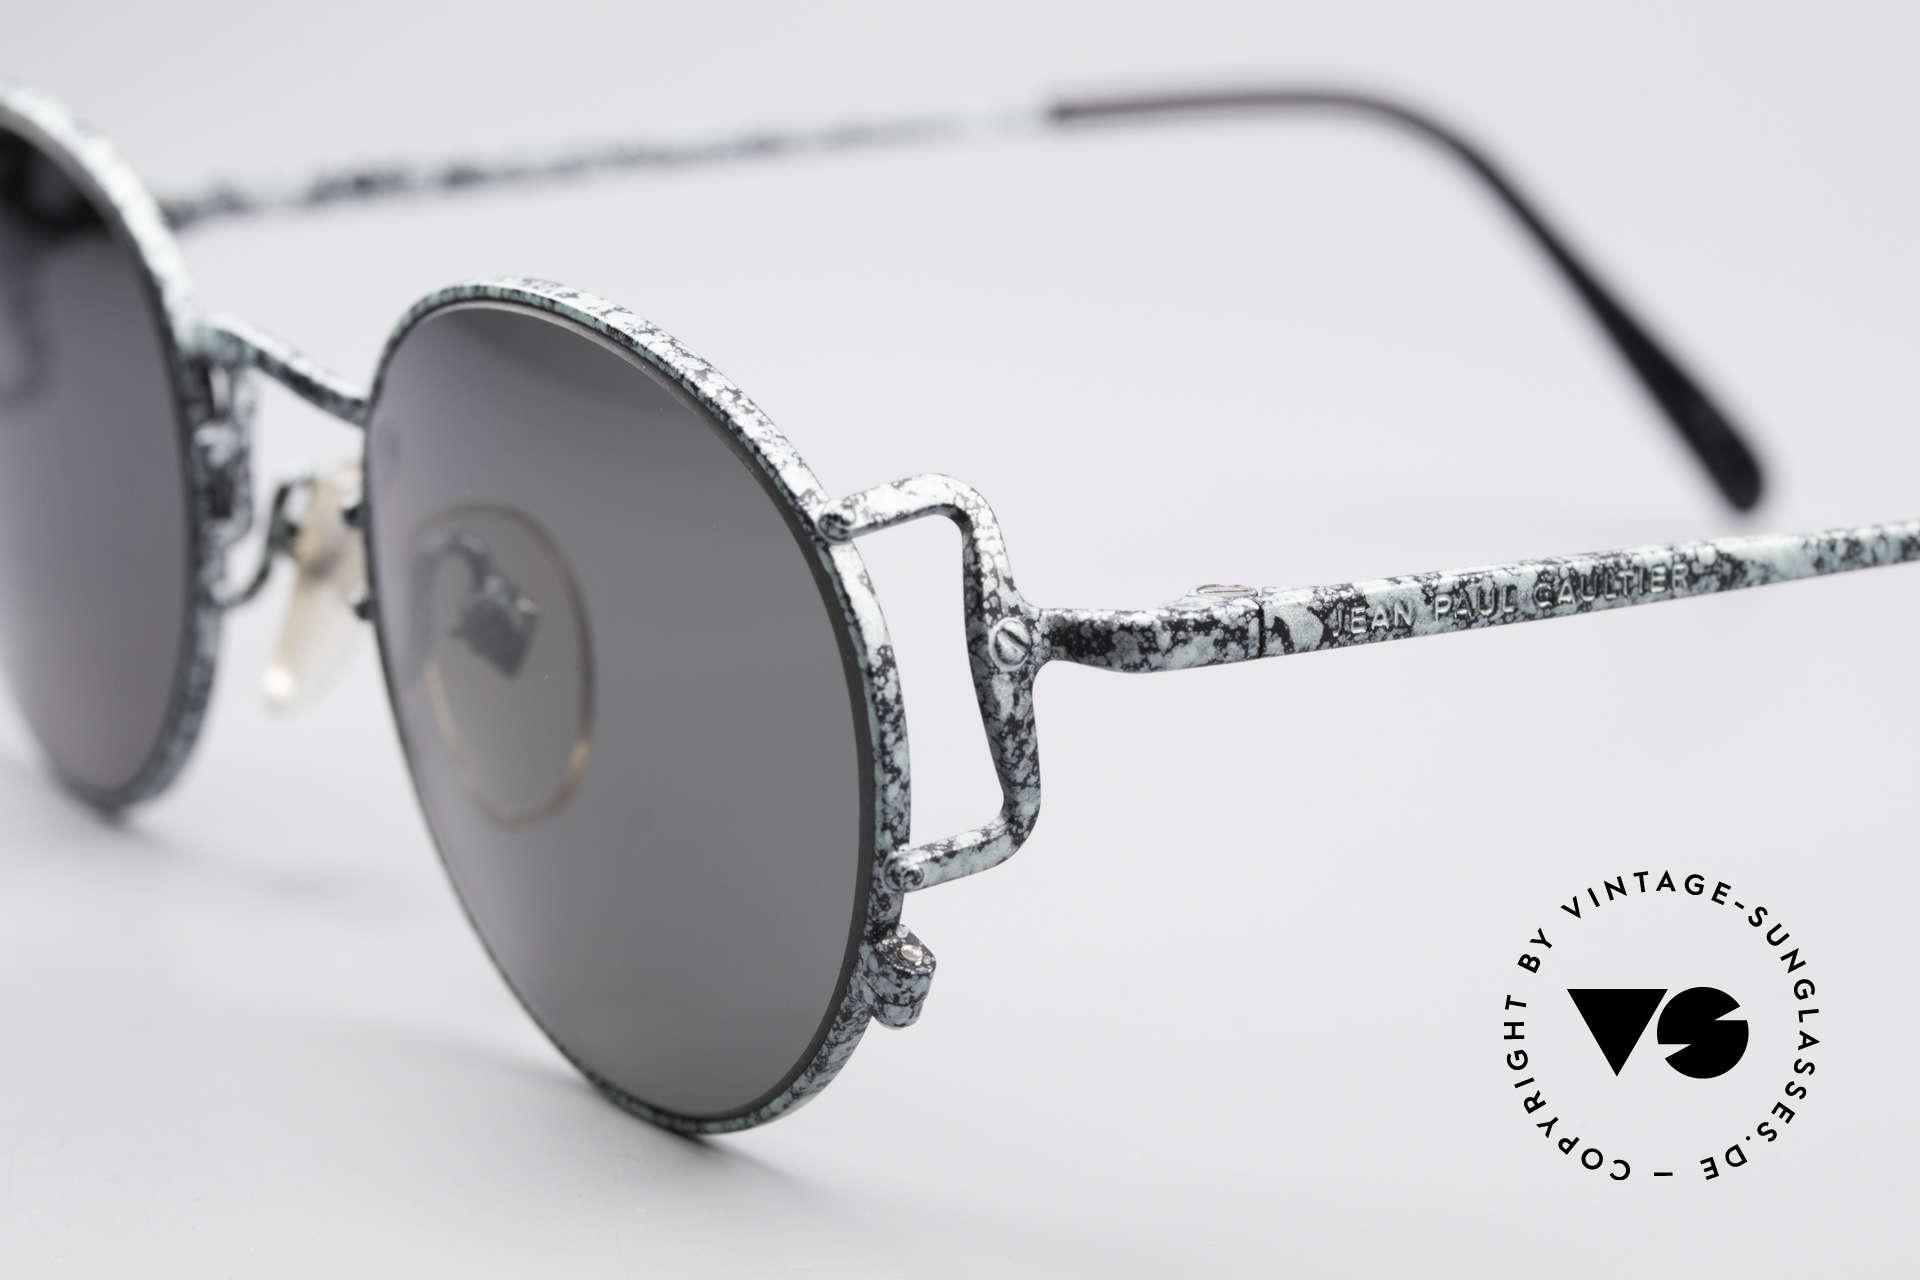 Jean Paul Gaultier 55-3178 Polarized JPG Sunglasses, unworn (like all our old 1990's designer glasses), Made for Men and Women